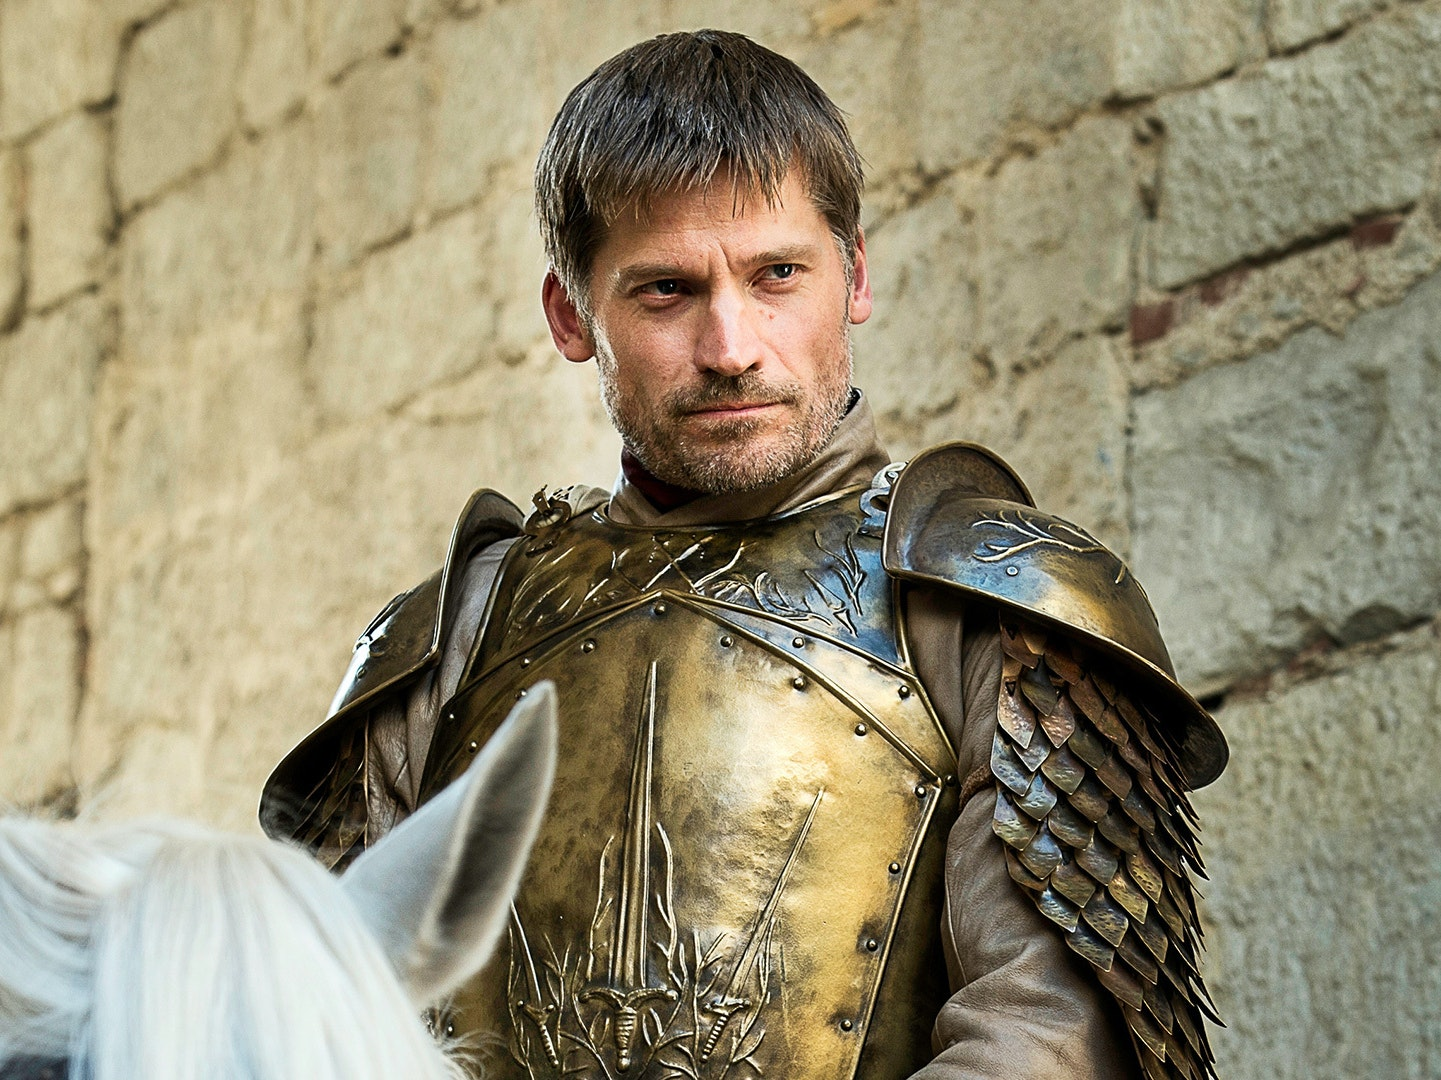 The Lannisters Will Sack Highgarden in 'GoT' Season 7